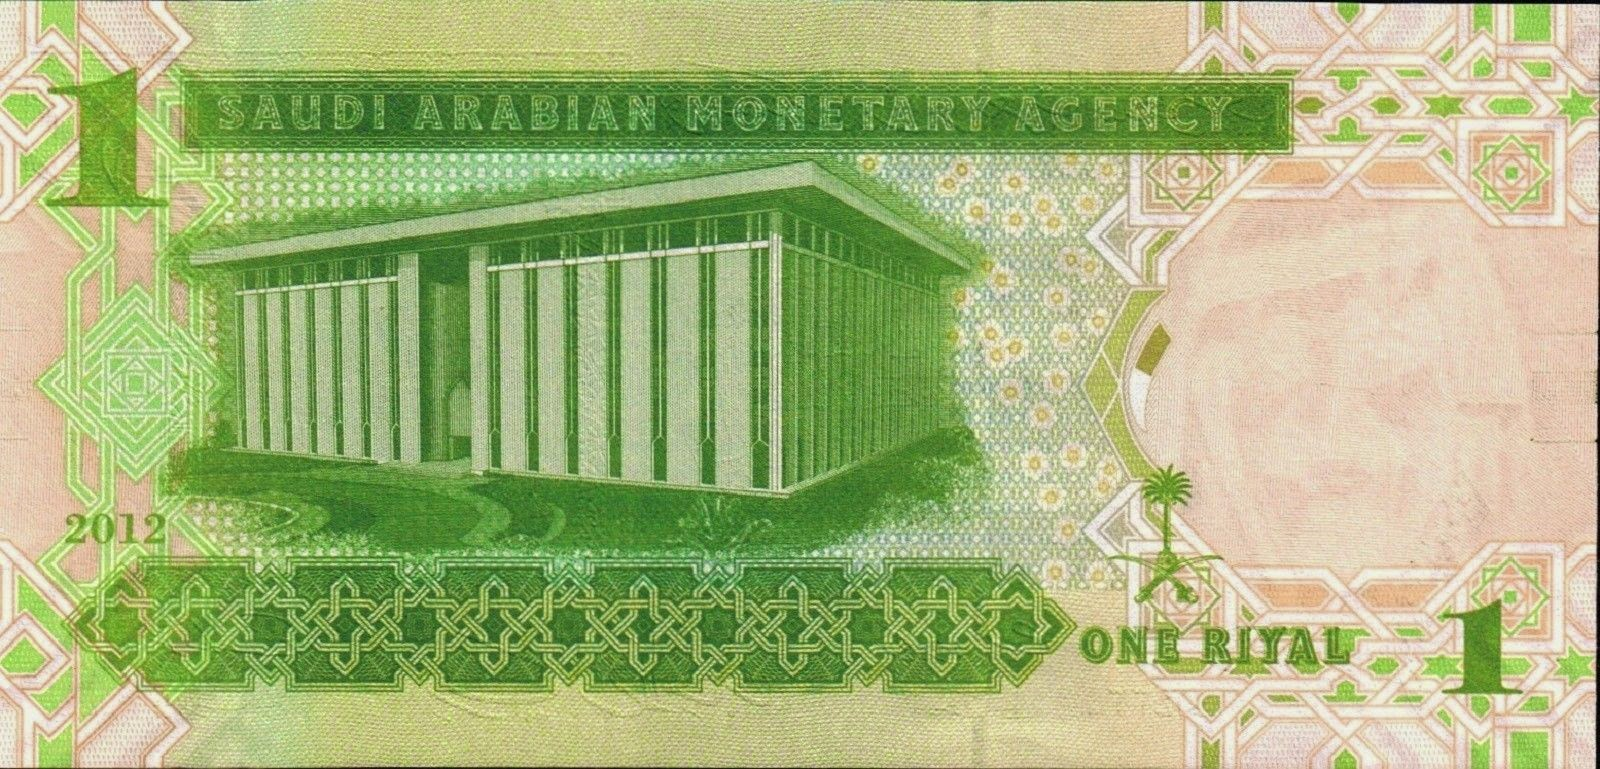 1 Saudi Riyal Note 2012 Saudi Arabian Monetary Agency